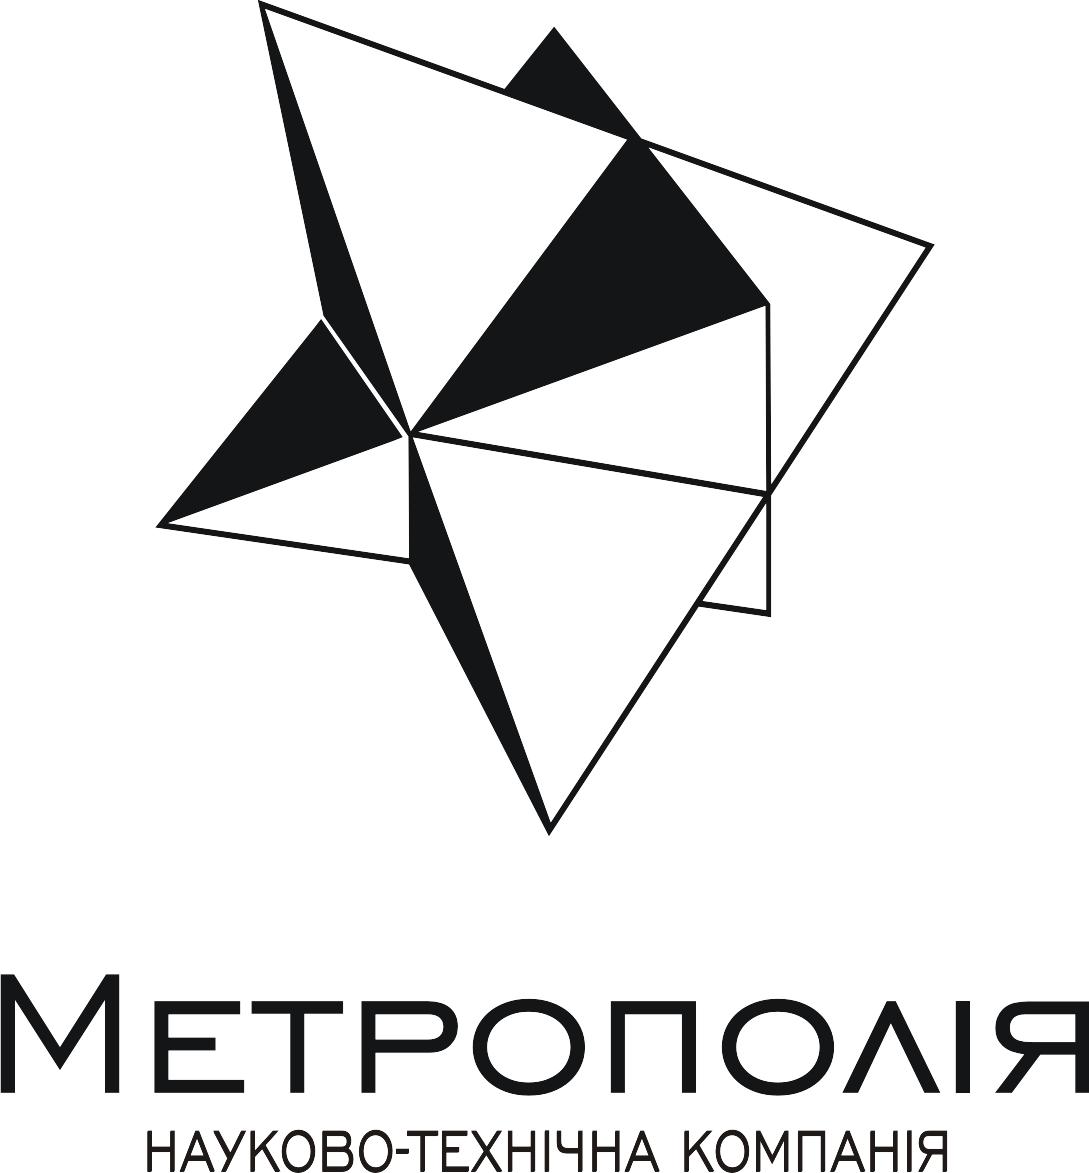 Metropoliya